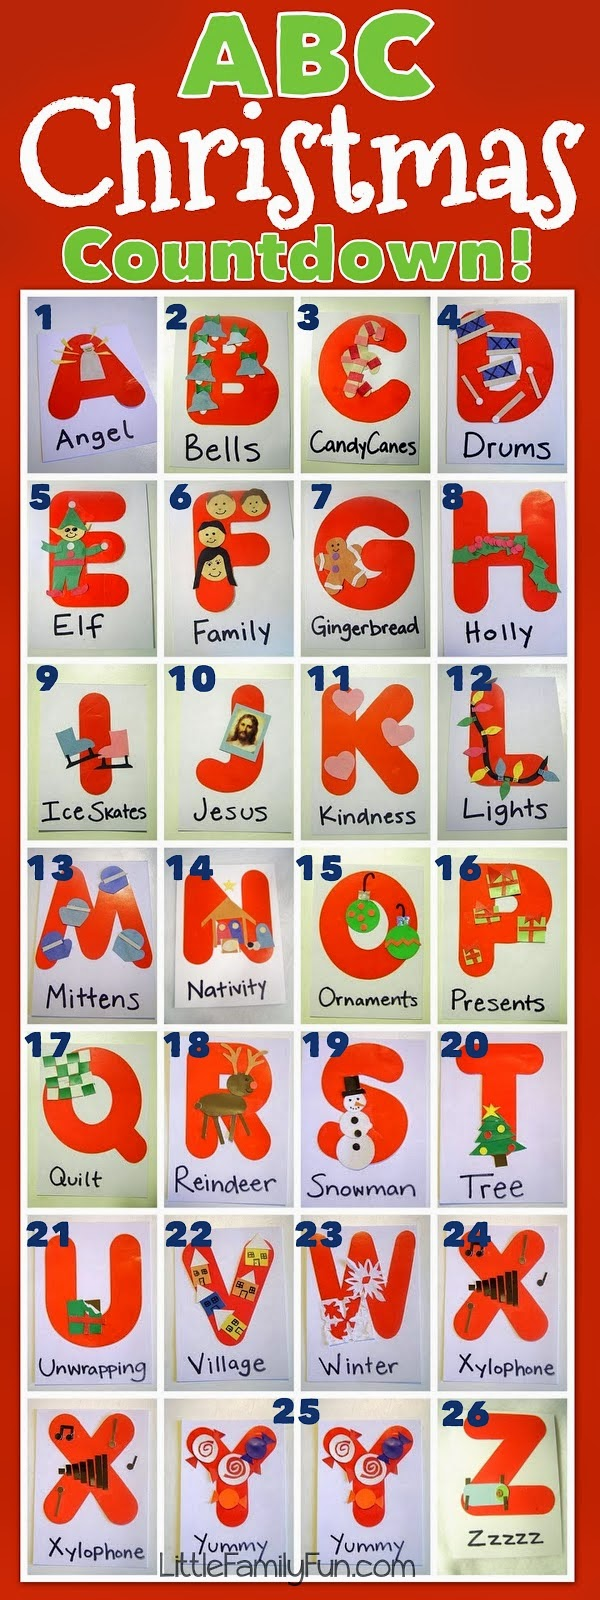 http://www.littlefamilyfun.com/2010/11/abc-christmas-countdown.html